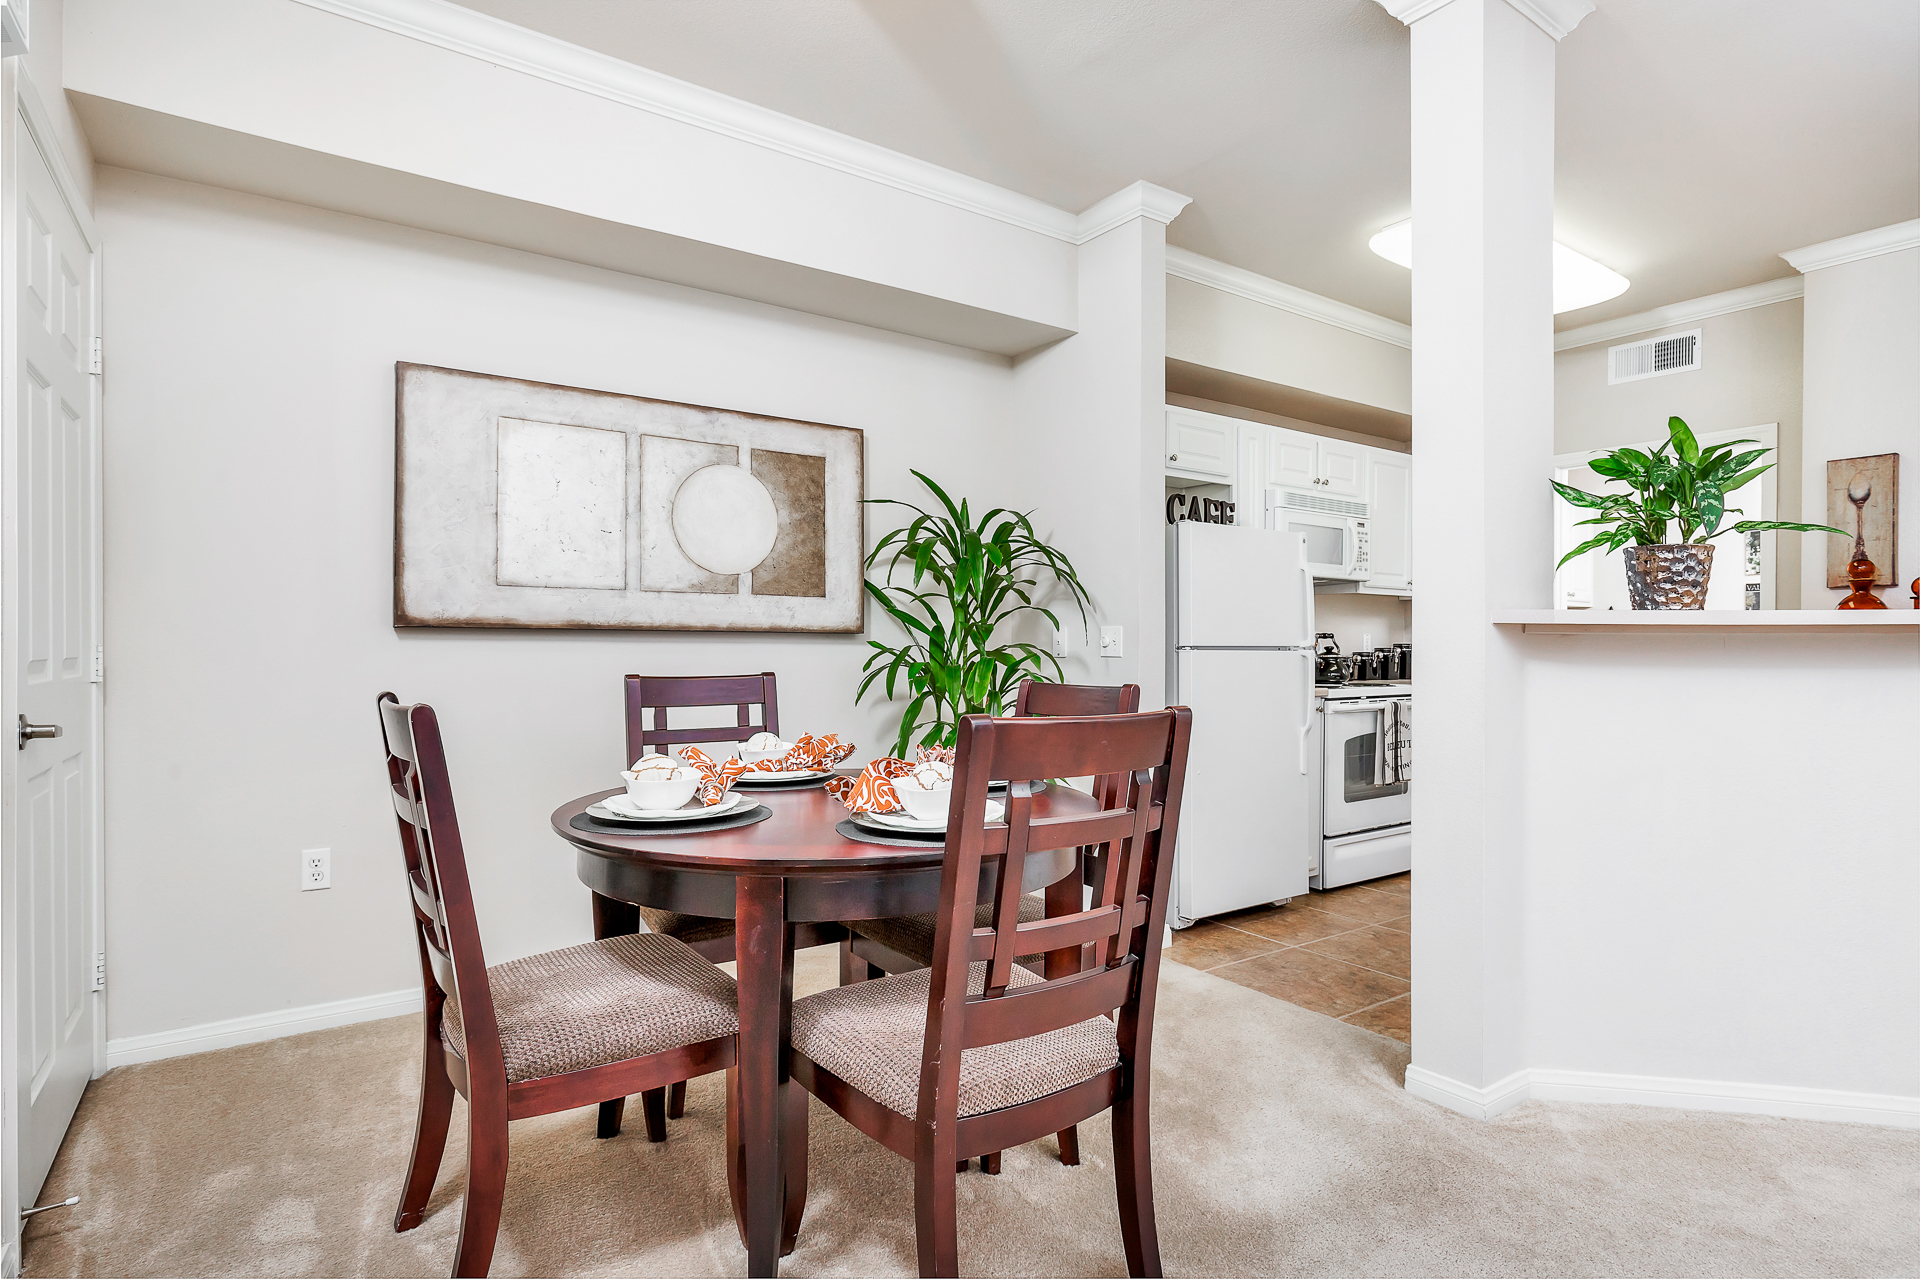 28-Sycamore-Terrace-Apartments-Photo-by-Brad-Ahlm-FairMarketPhoto-FullRes.jpg